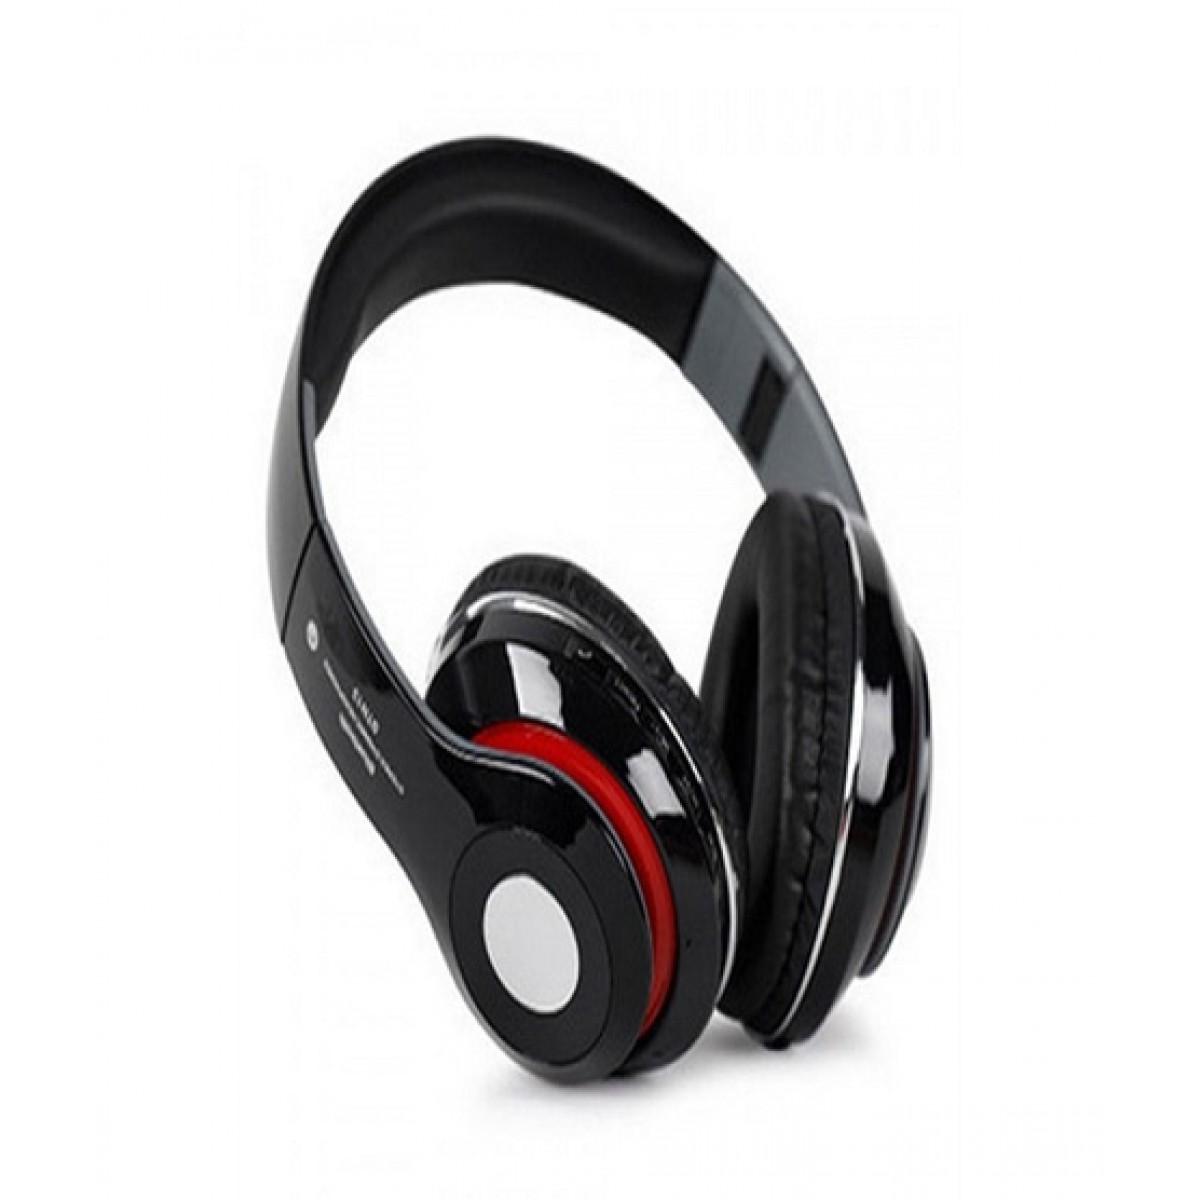 Oro Store Bluetooth Headphones Price In Pakistan Buy Oro Store Wireless Headphones Black Stn 13 Ishopping Pk